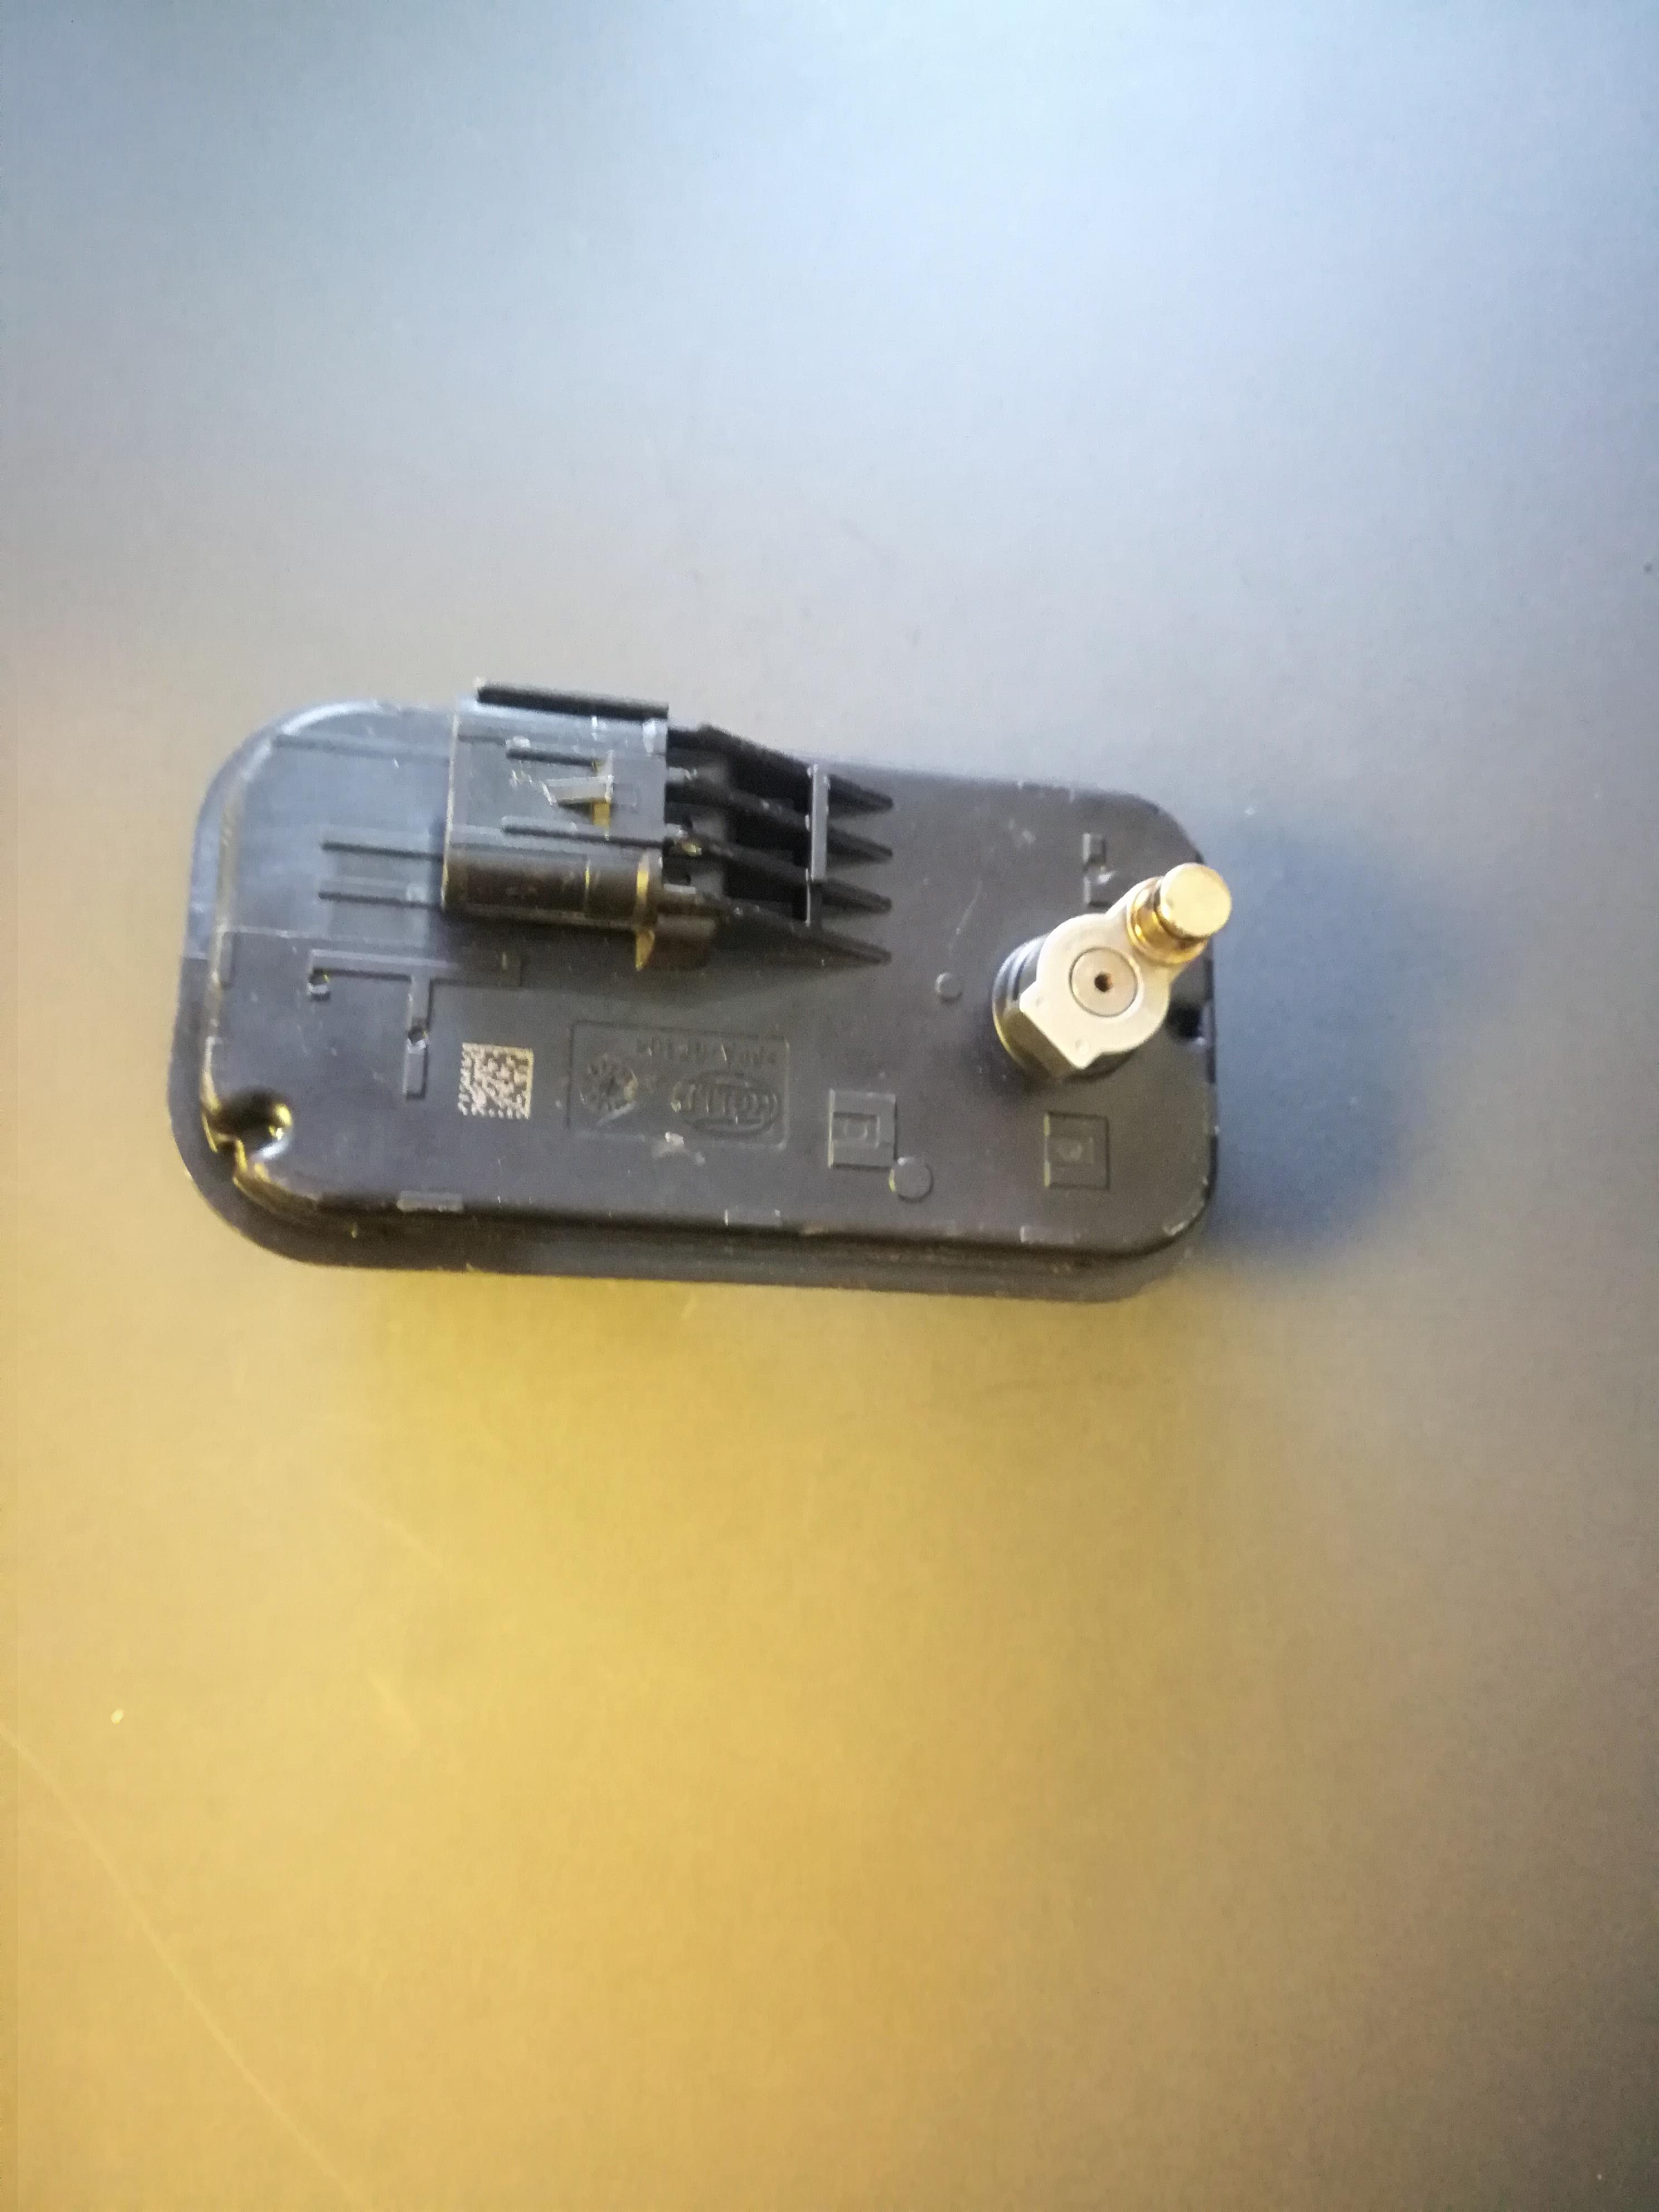 6NW 934 803-02 turbo wastegate actuator   830604-0028,